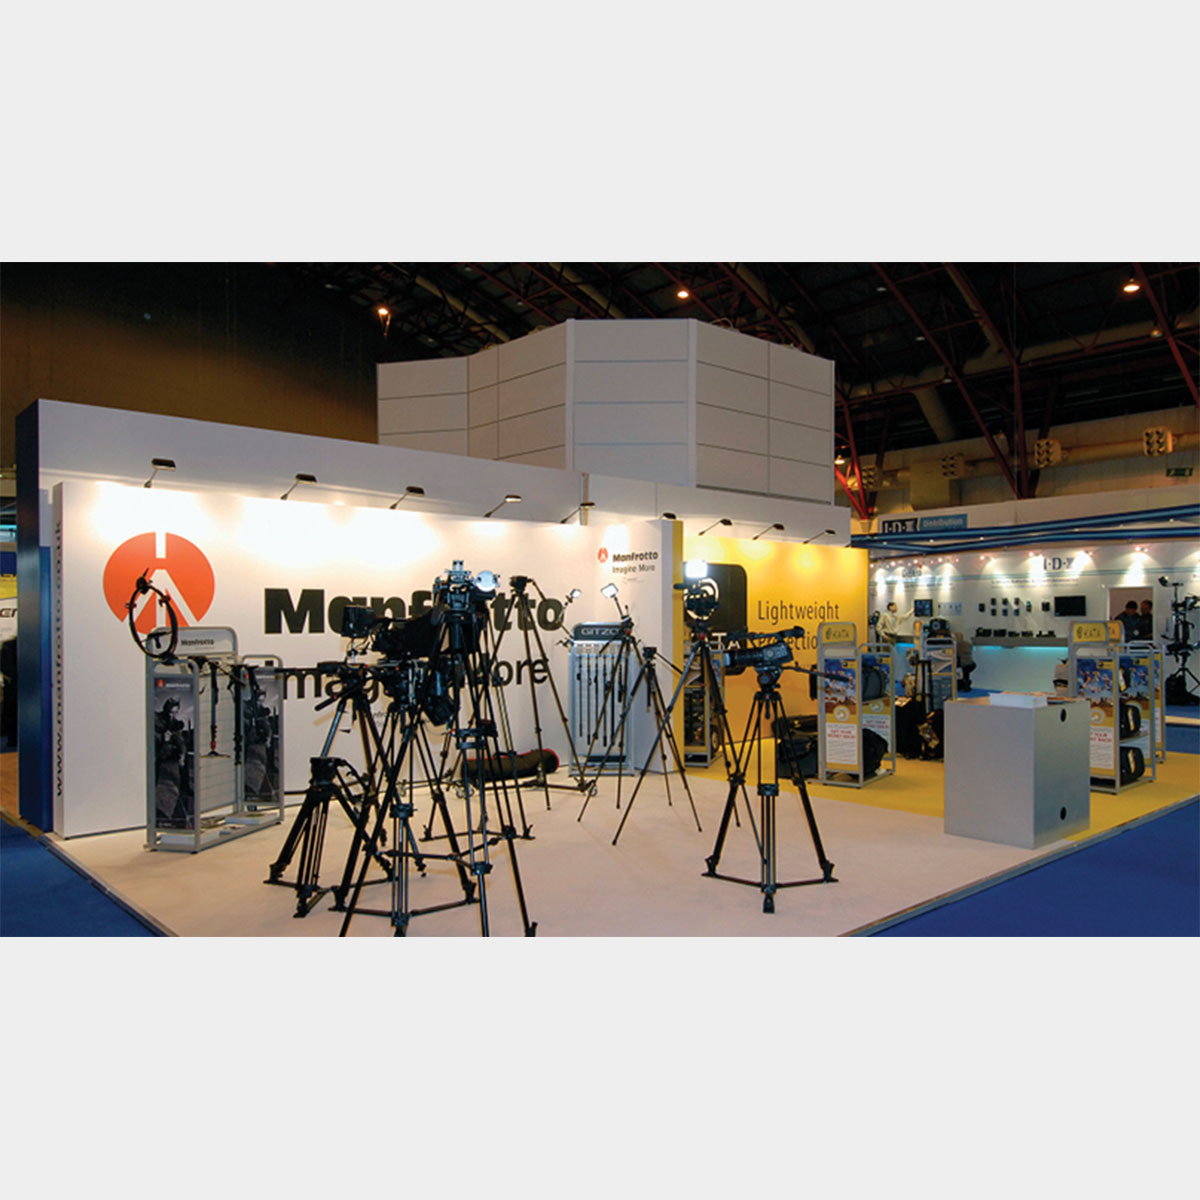 Modular Exhibition Stands Yard : T modular exhibition stands